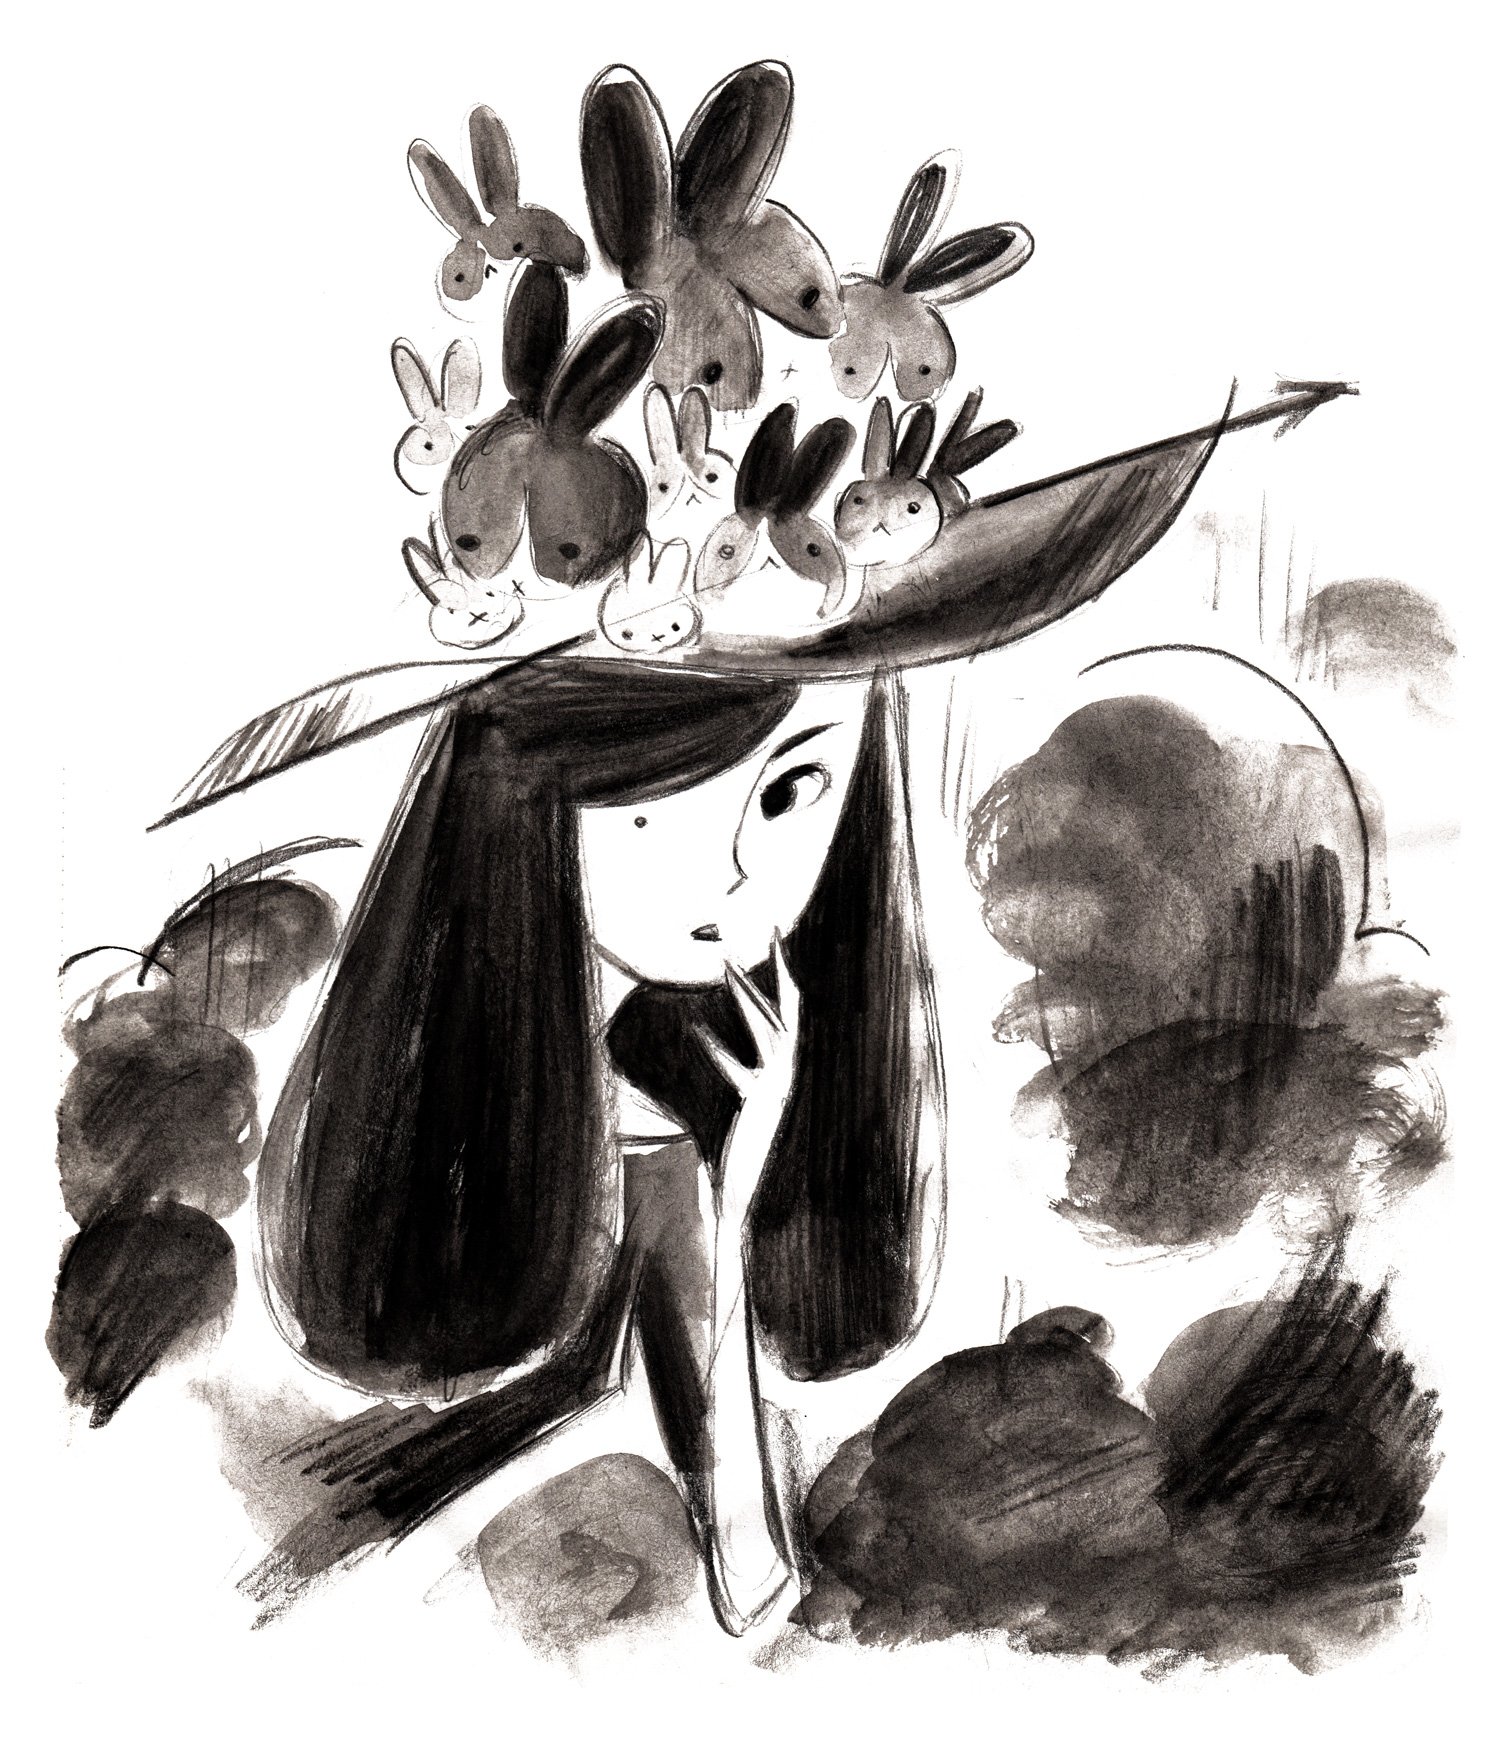 008-bunny-hat-girl.jpg